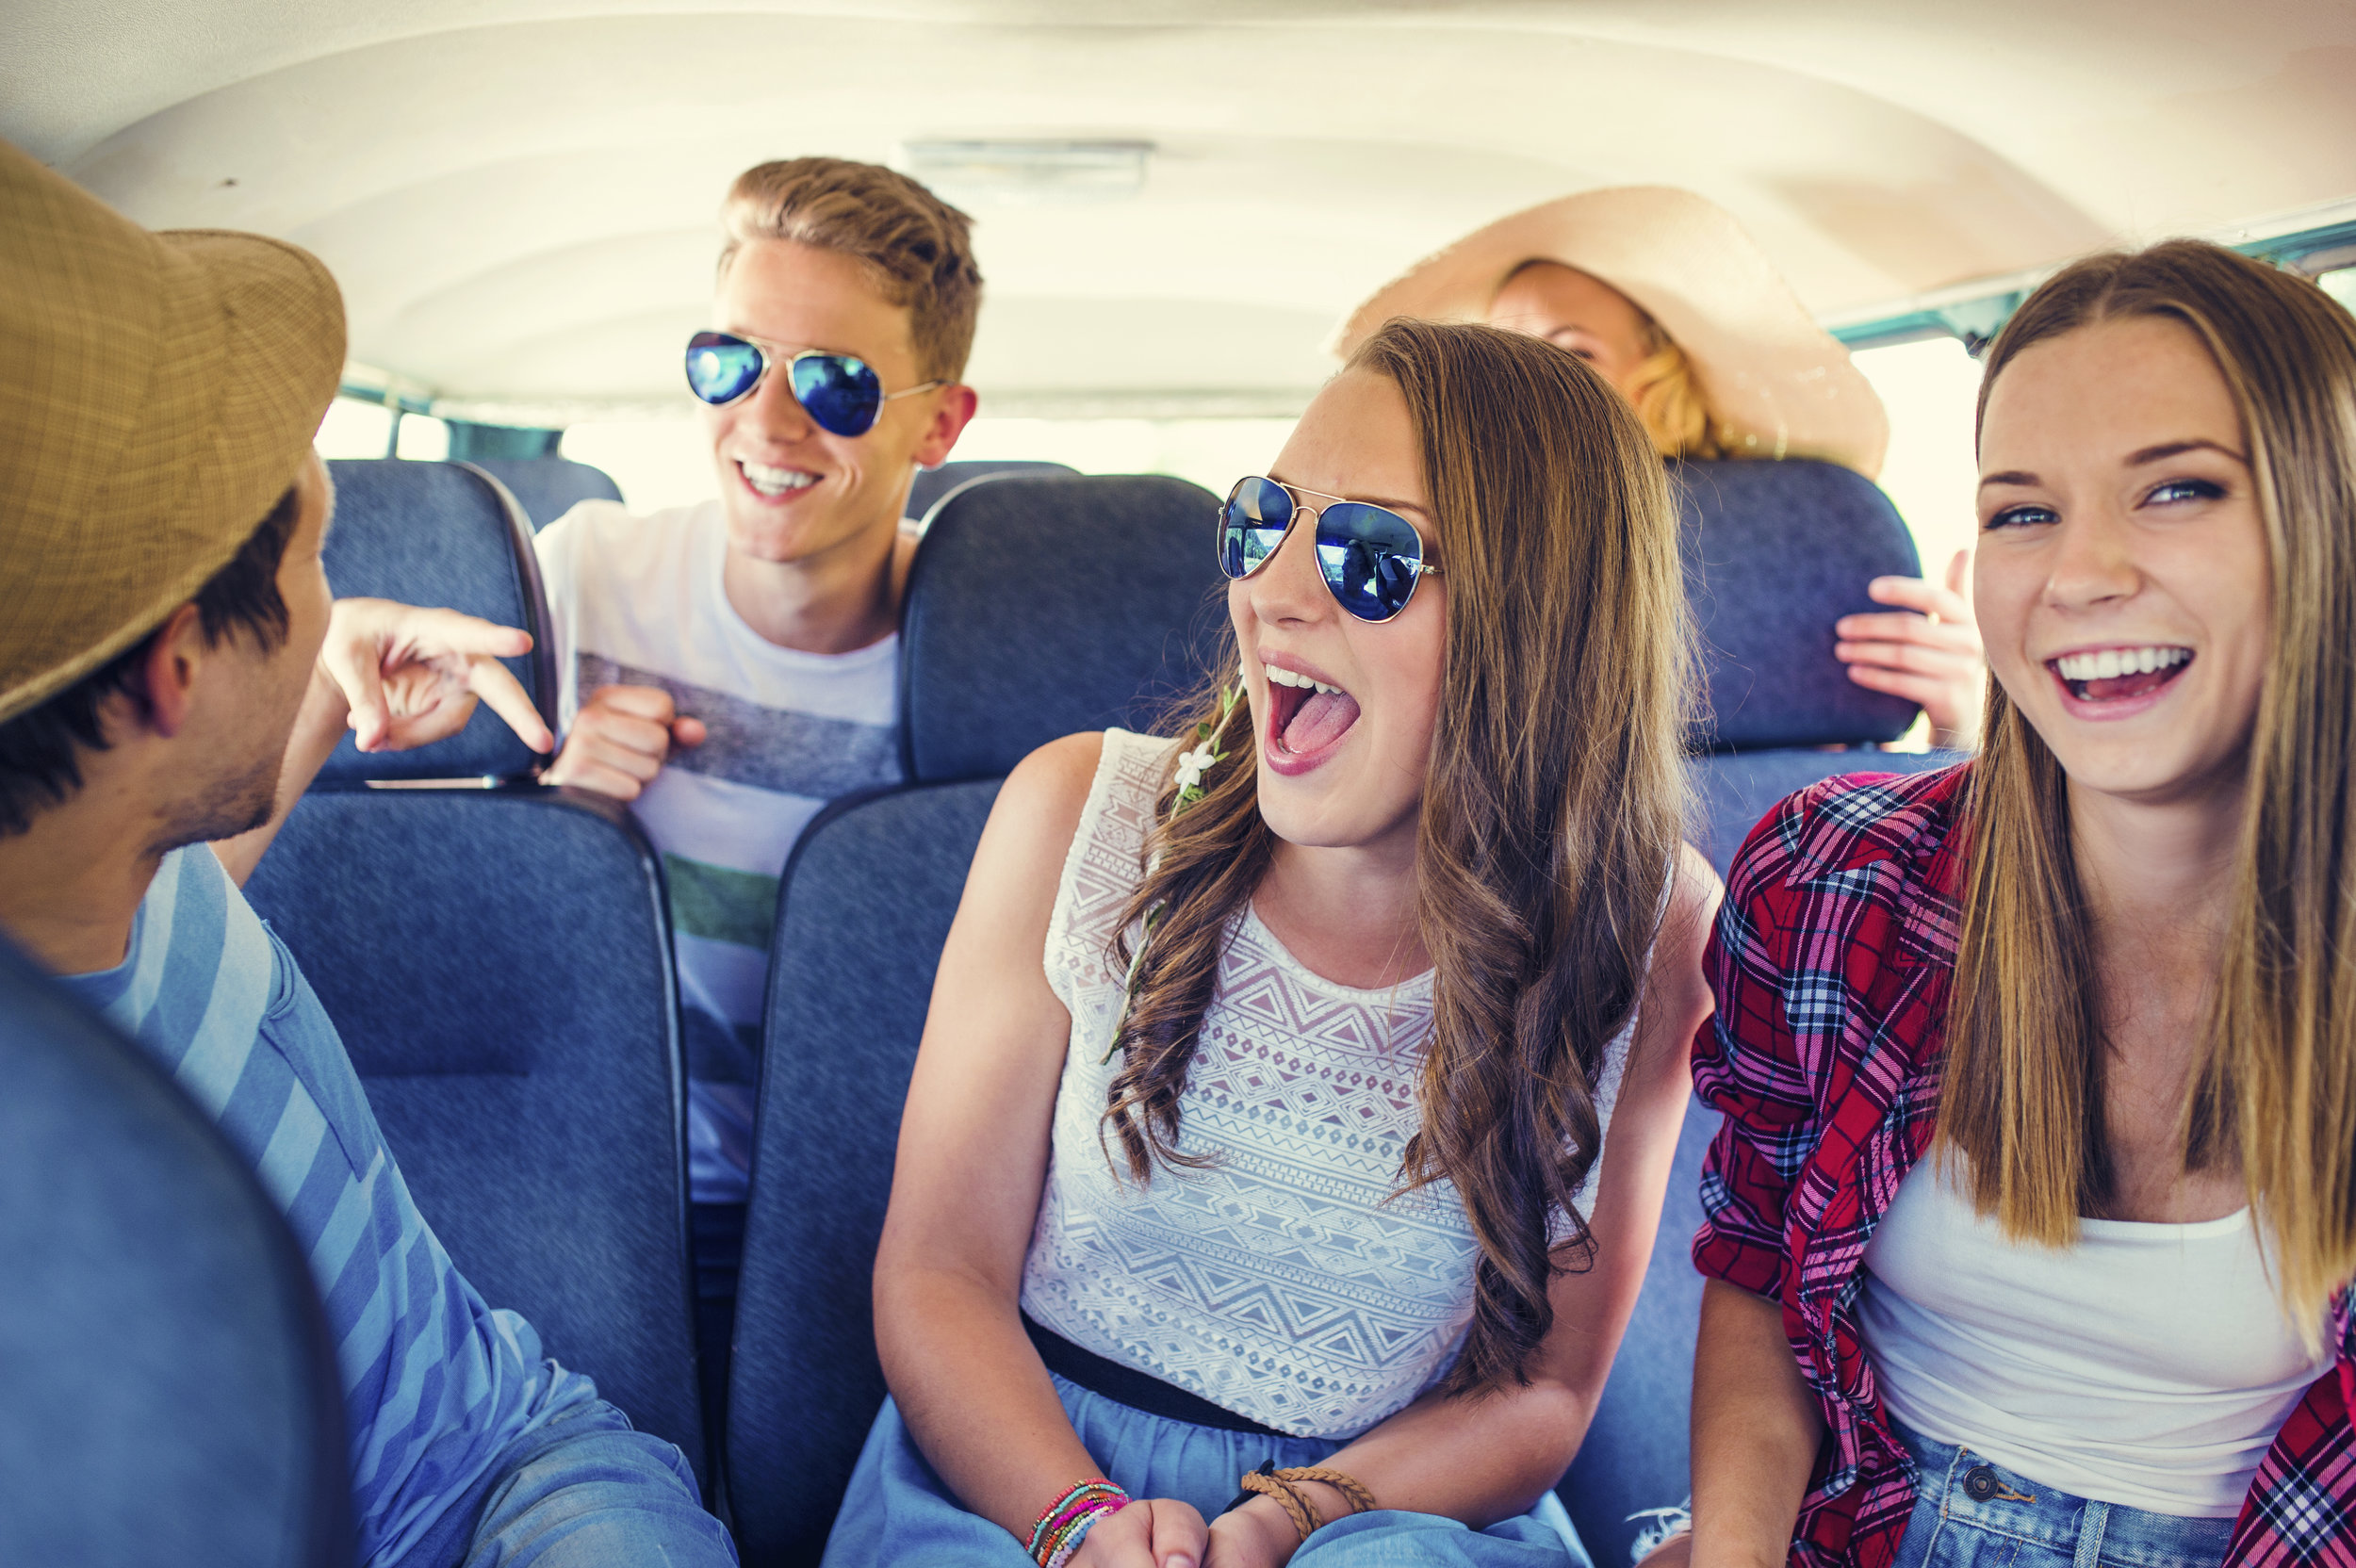 Carpooling saves everyone money